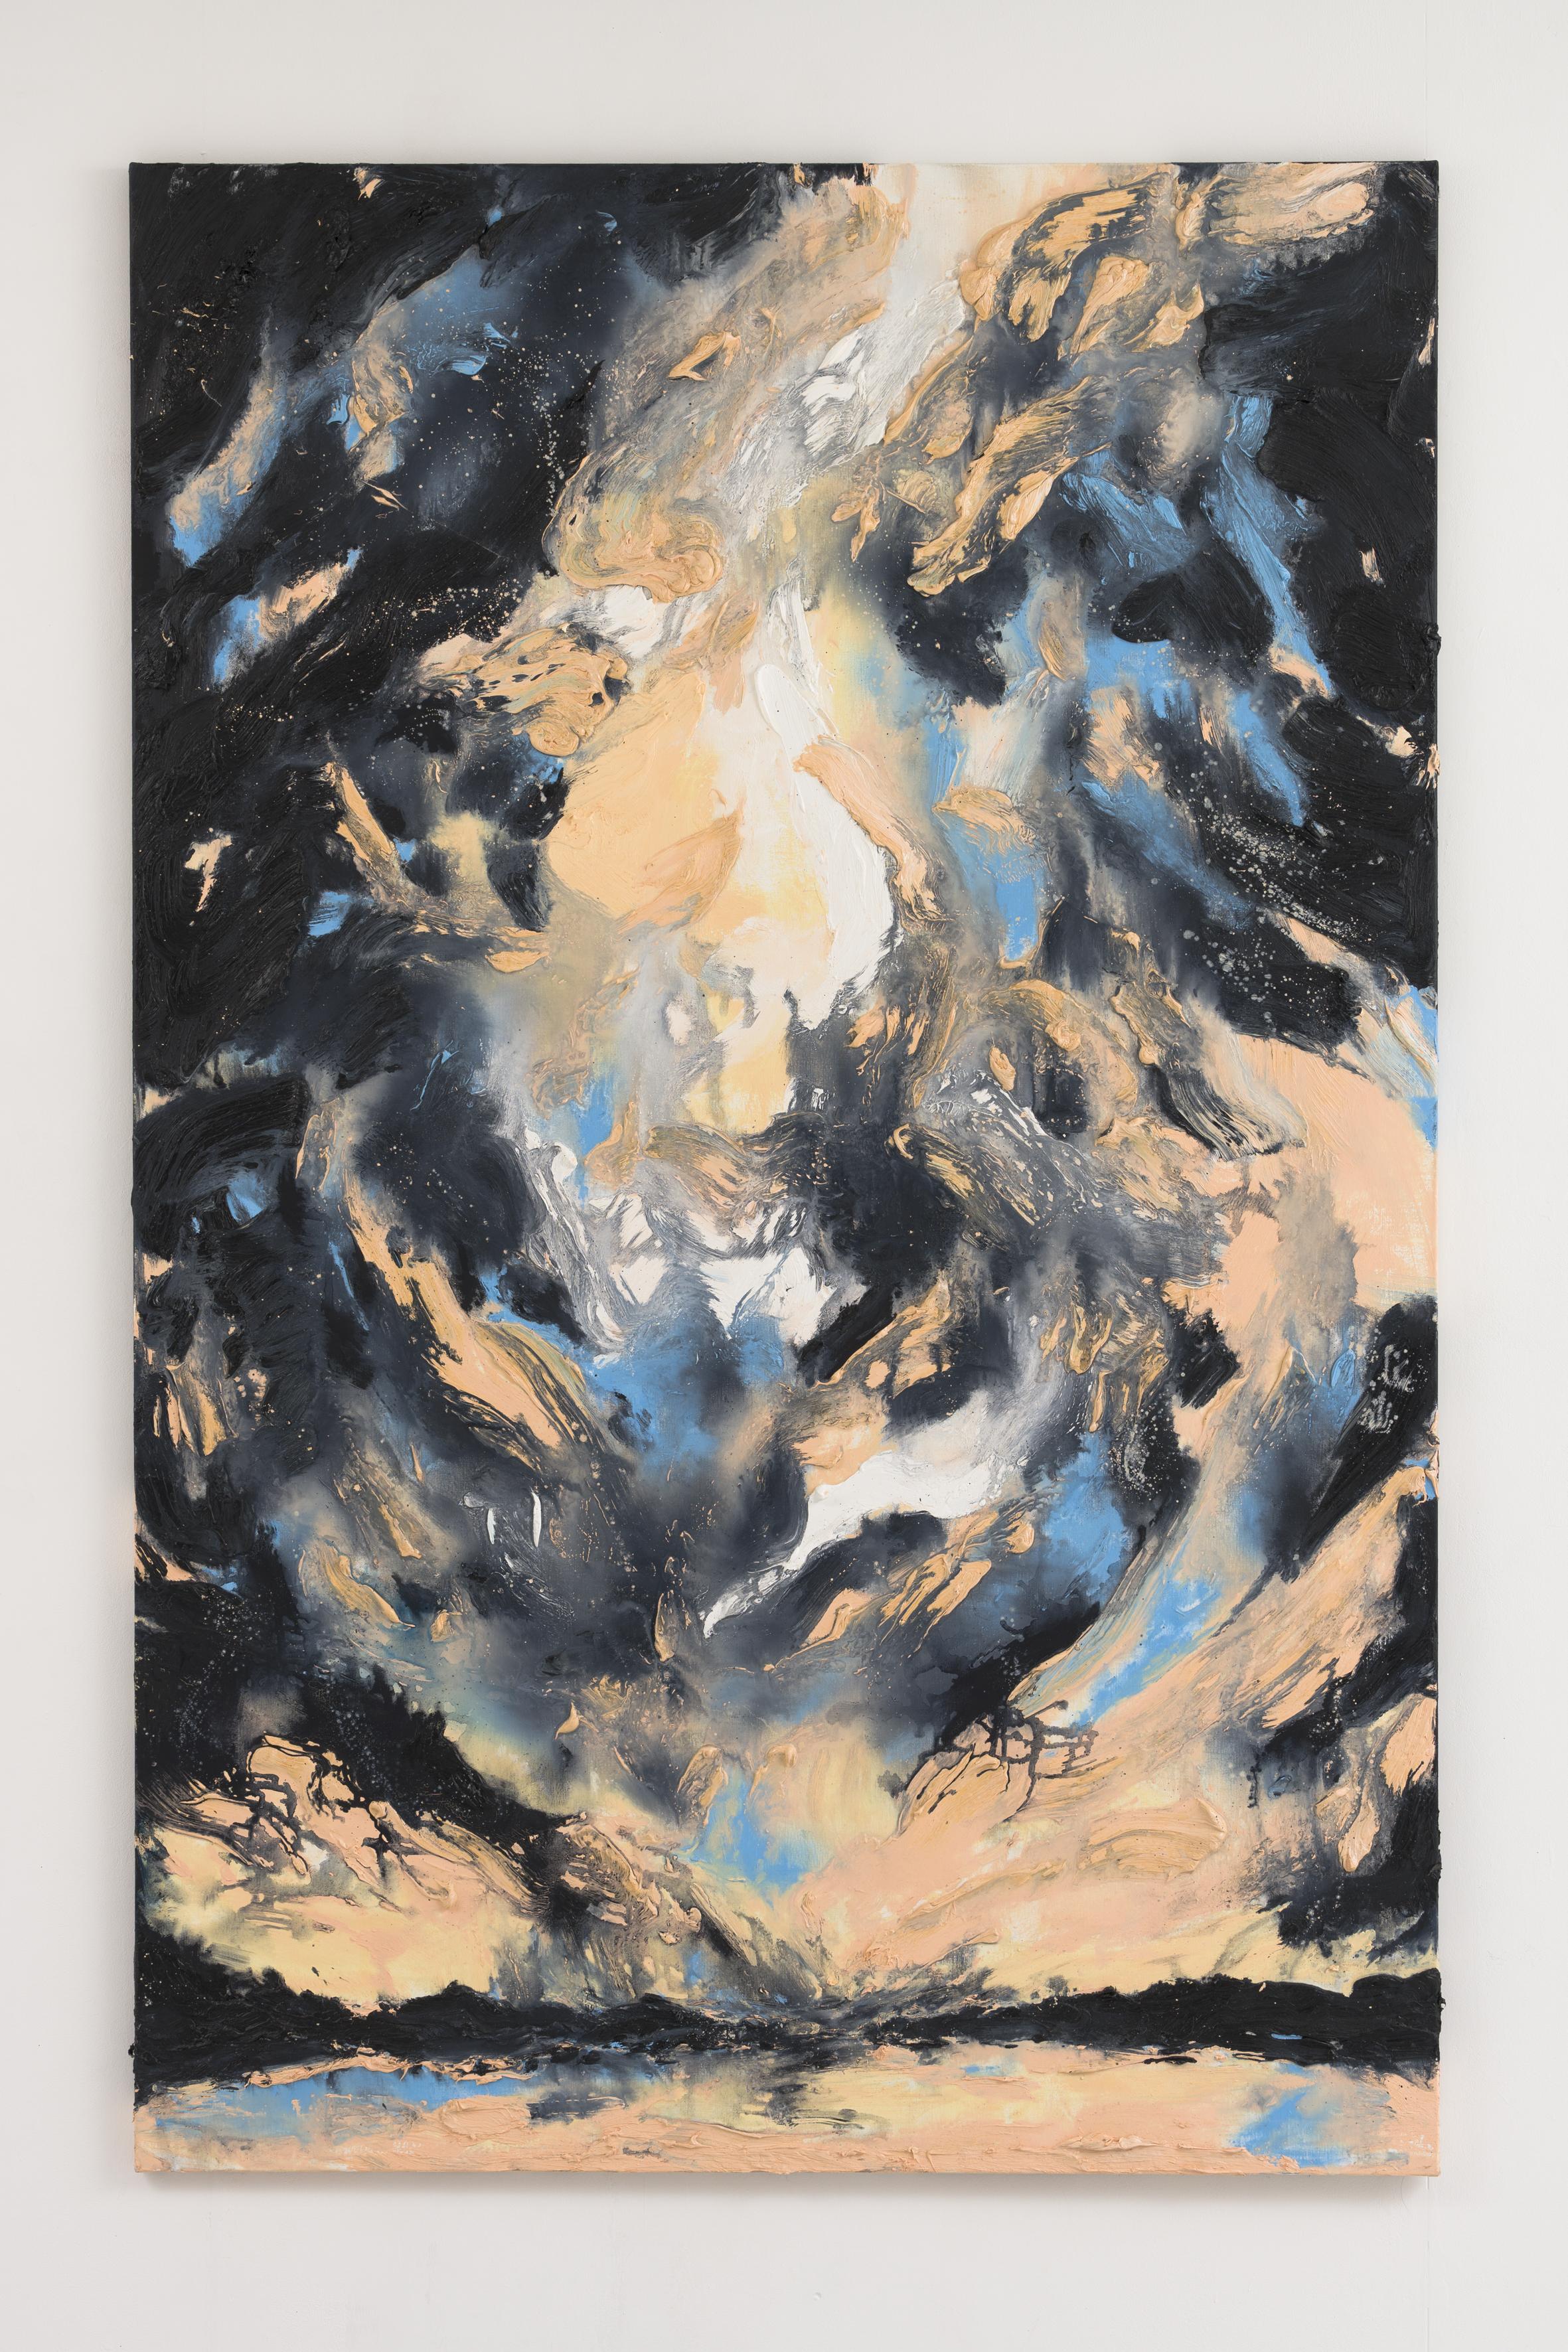 """Pfaueninsel am Havel I"", 200 x 130 cm., oil on linen 2020 (Berlin)"